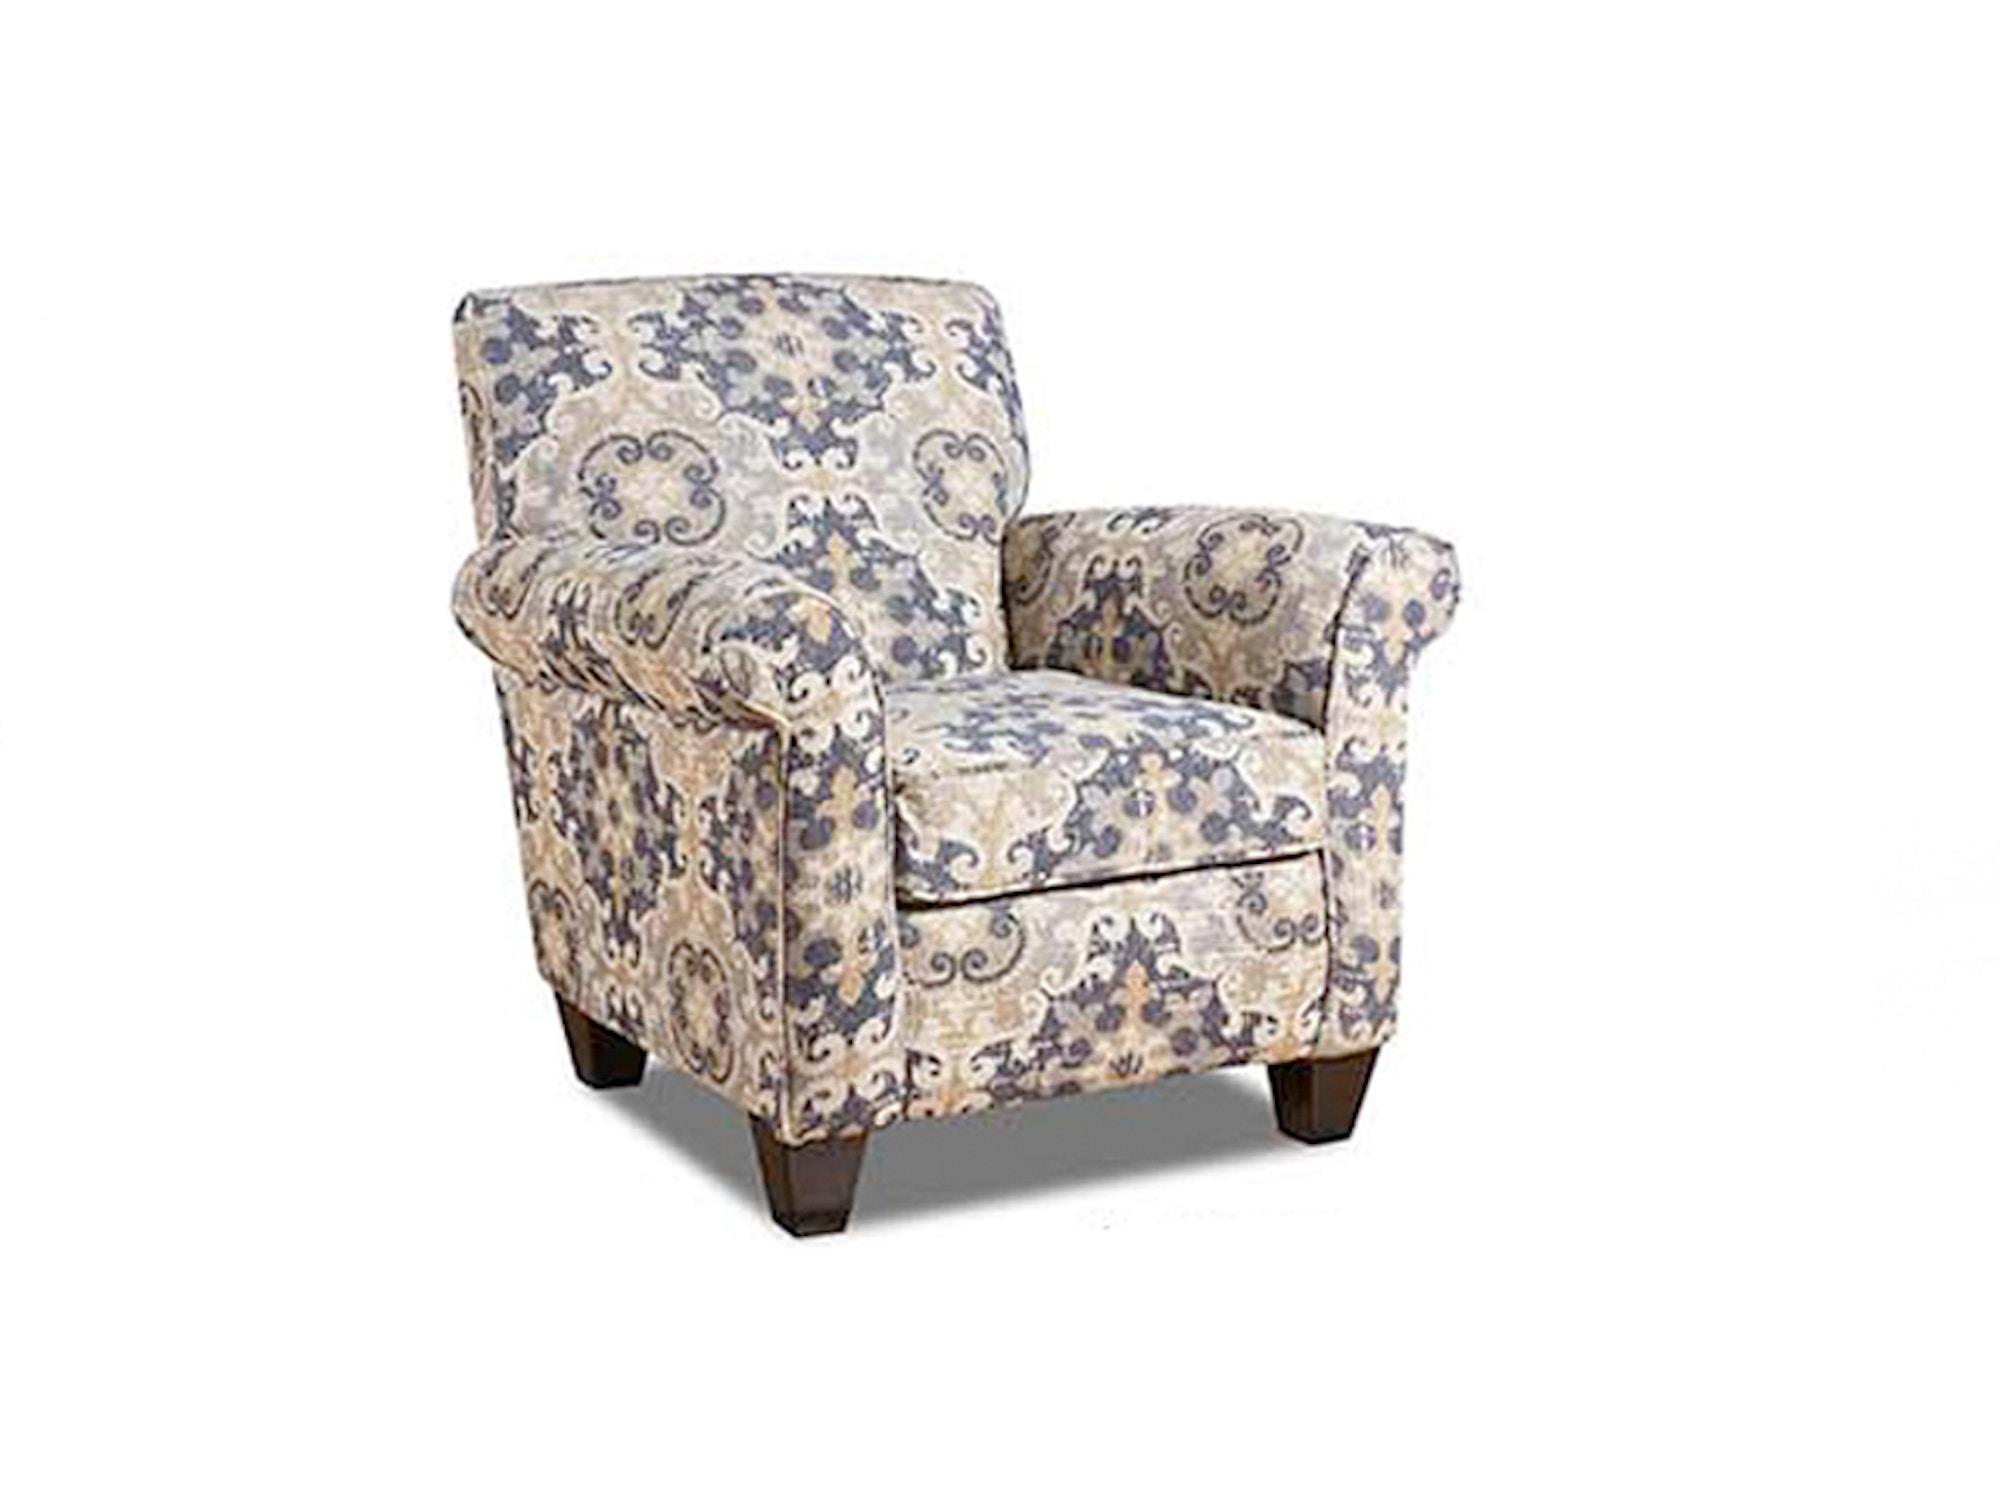 Corinthian Living Room Chairs - Furniture Fair - Cincinnati & Dayton ...